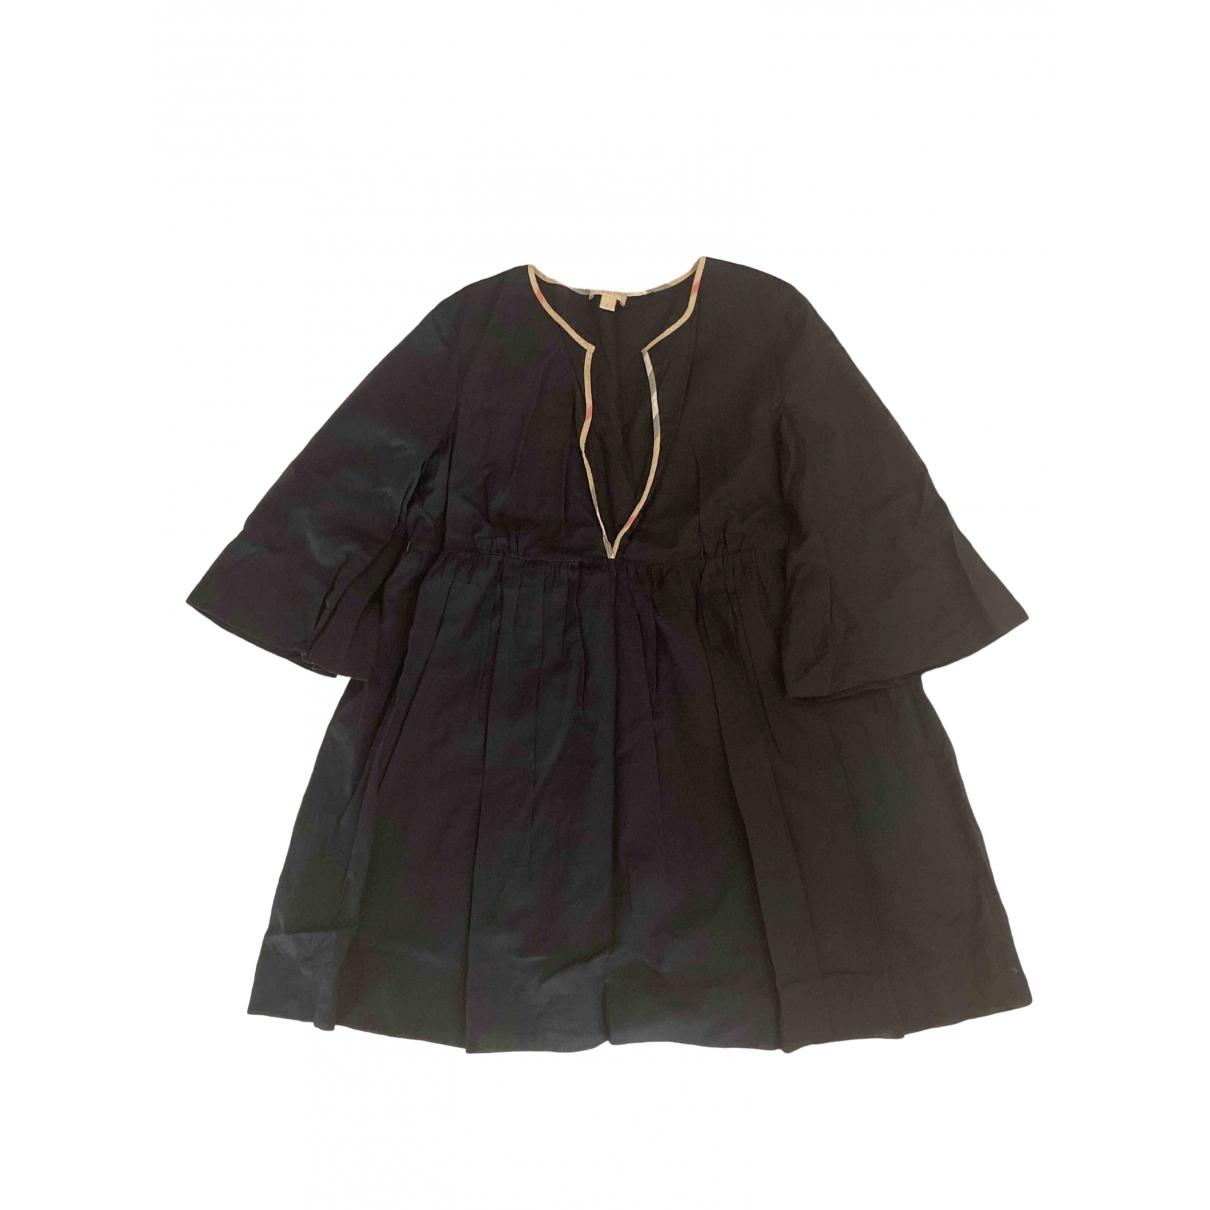 Burberry \N Black Cotton dress for Women S International